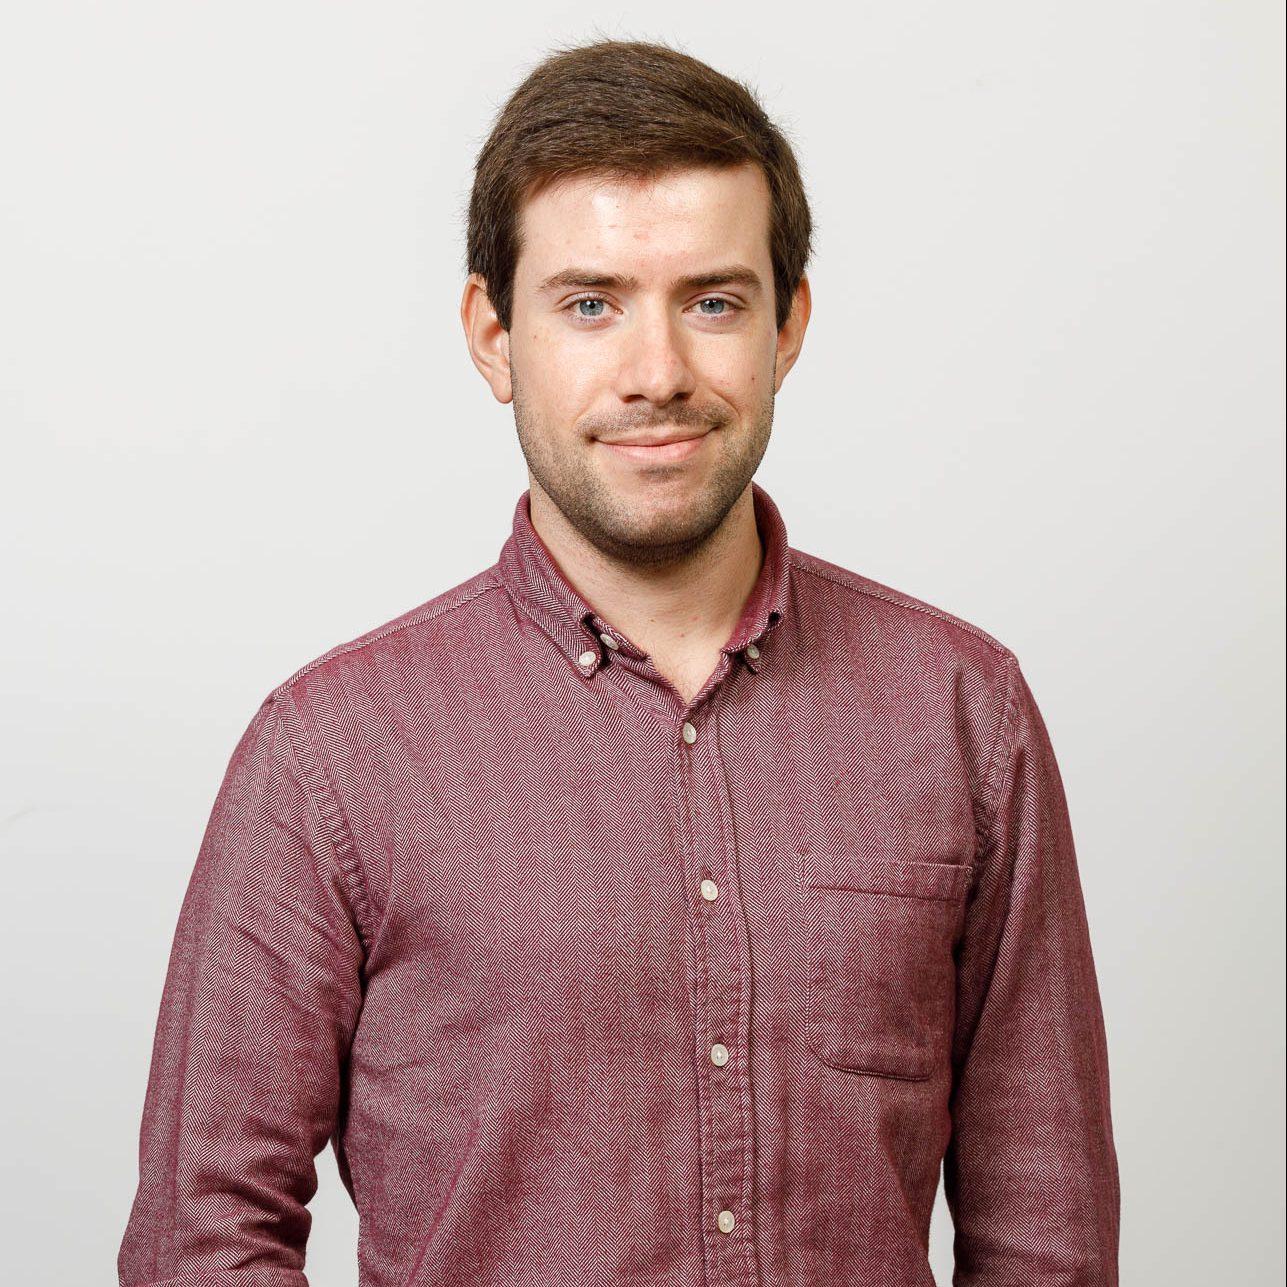 João Gonçalves - Product Manager